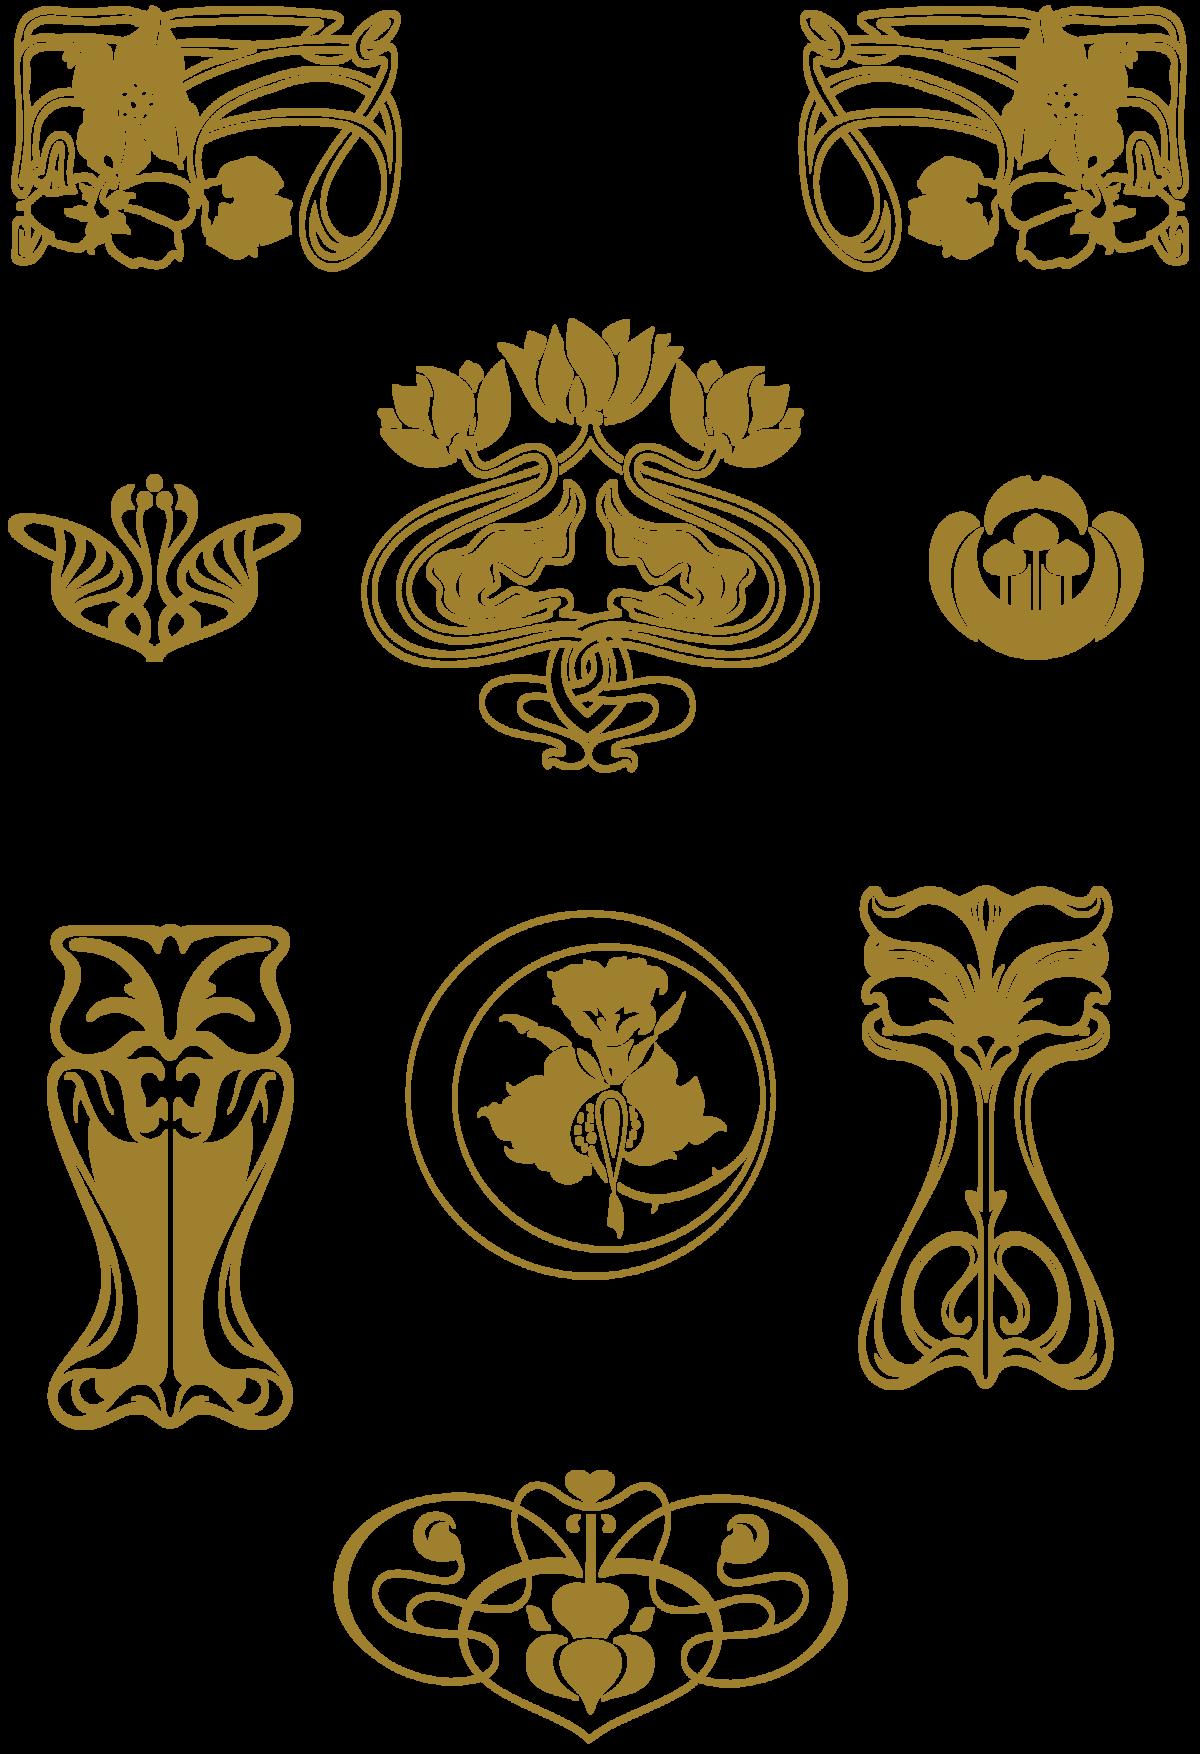 Логотип в стиле модерн картинки белая акула